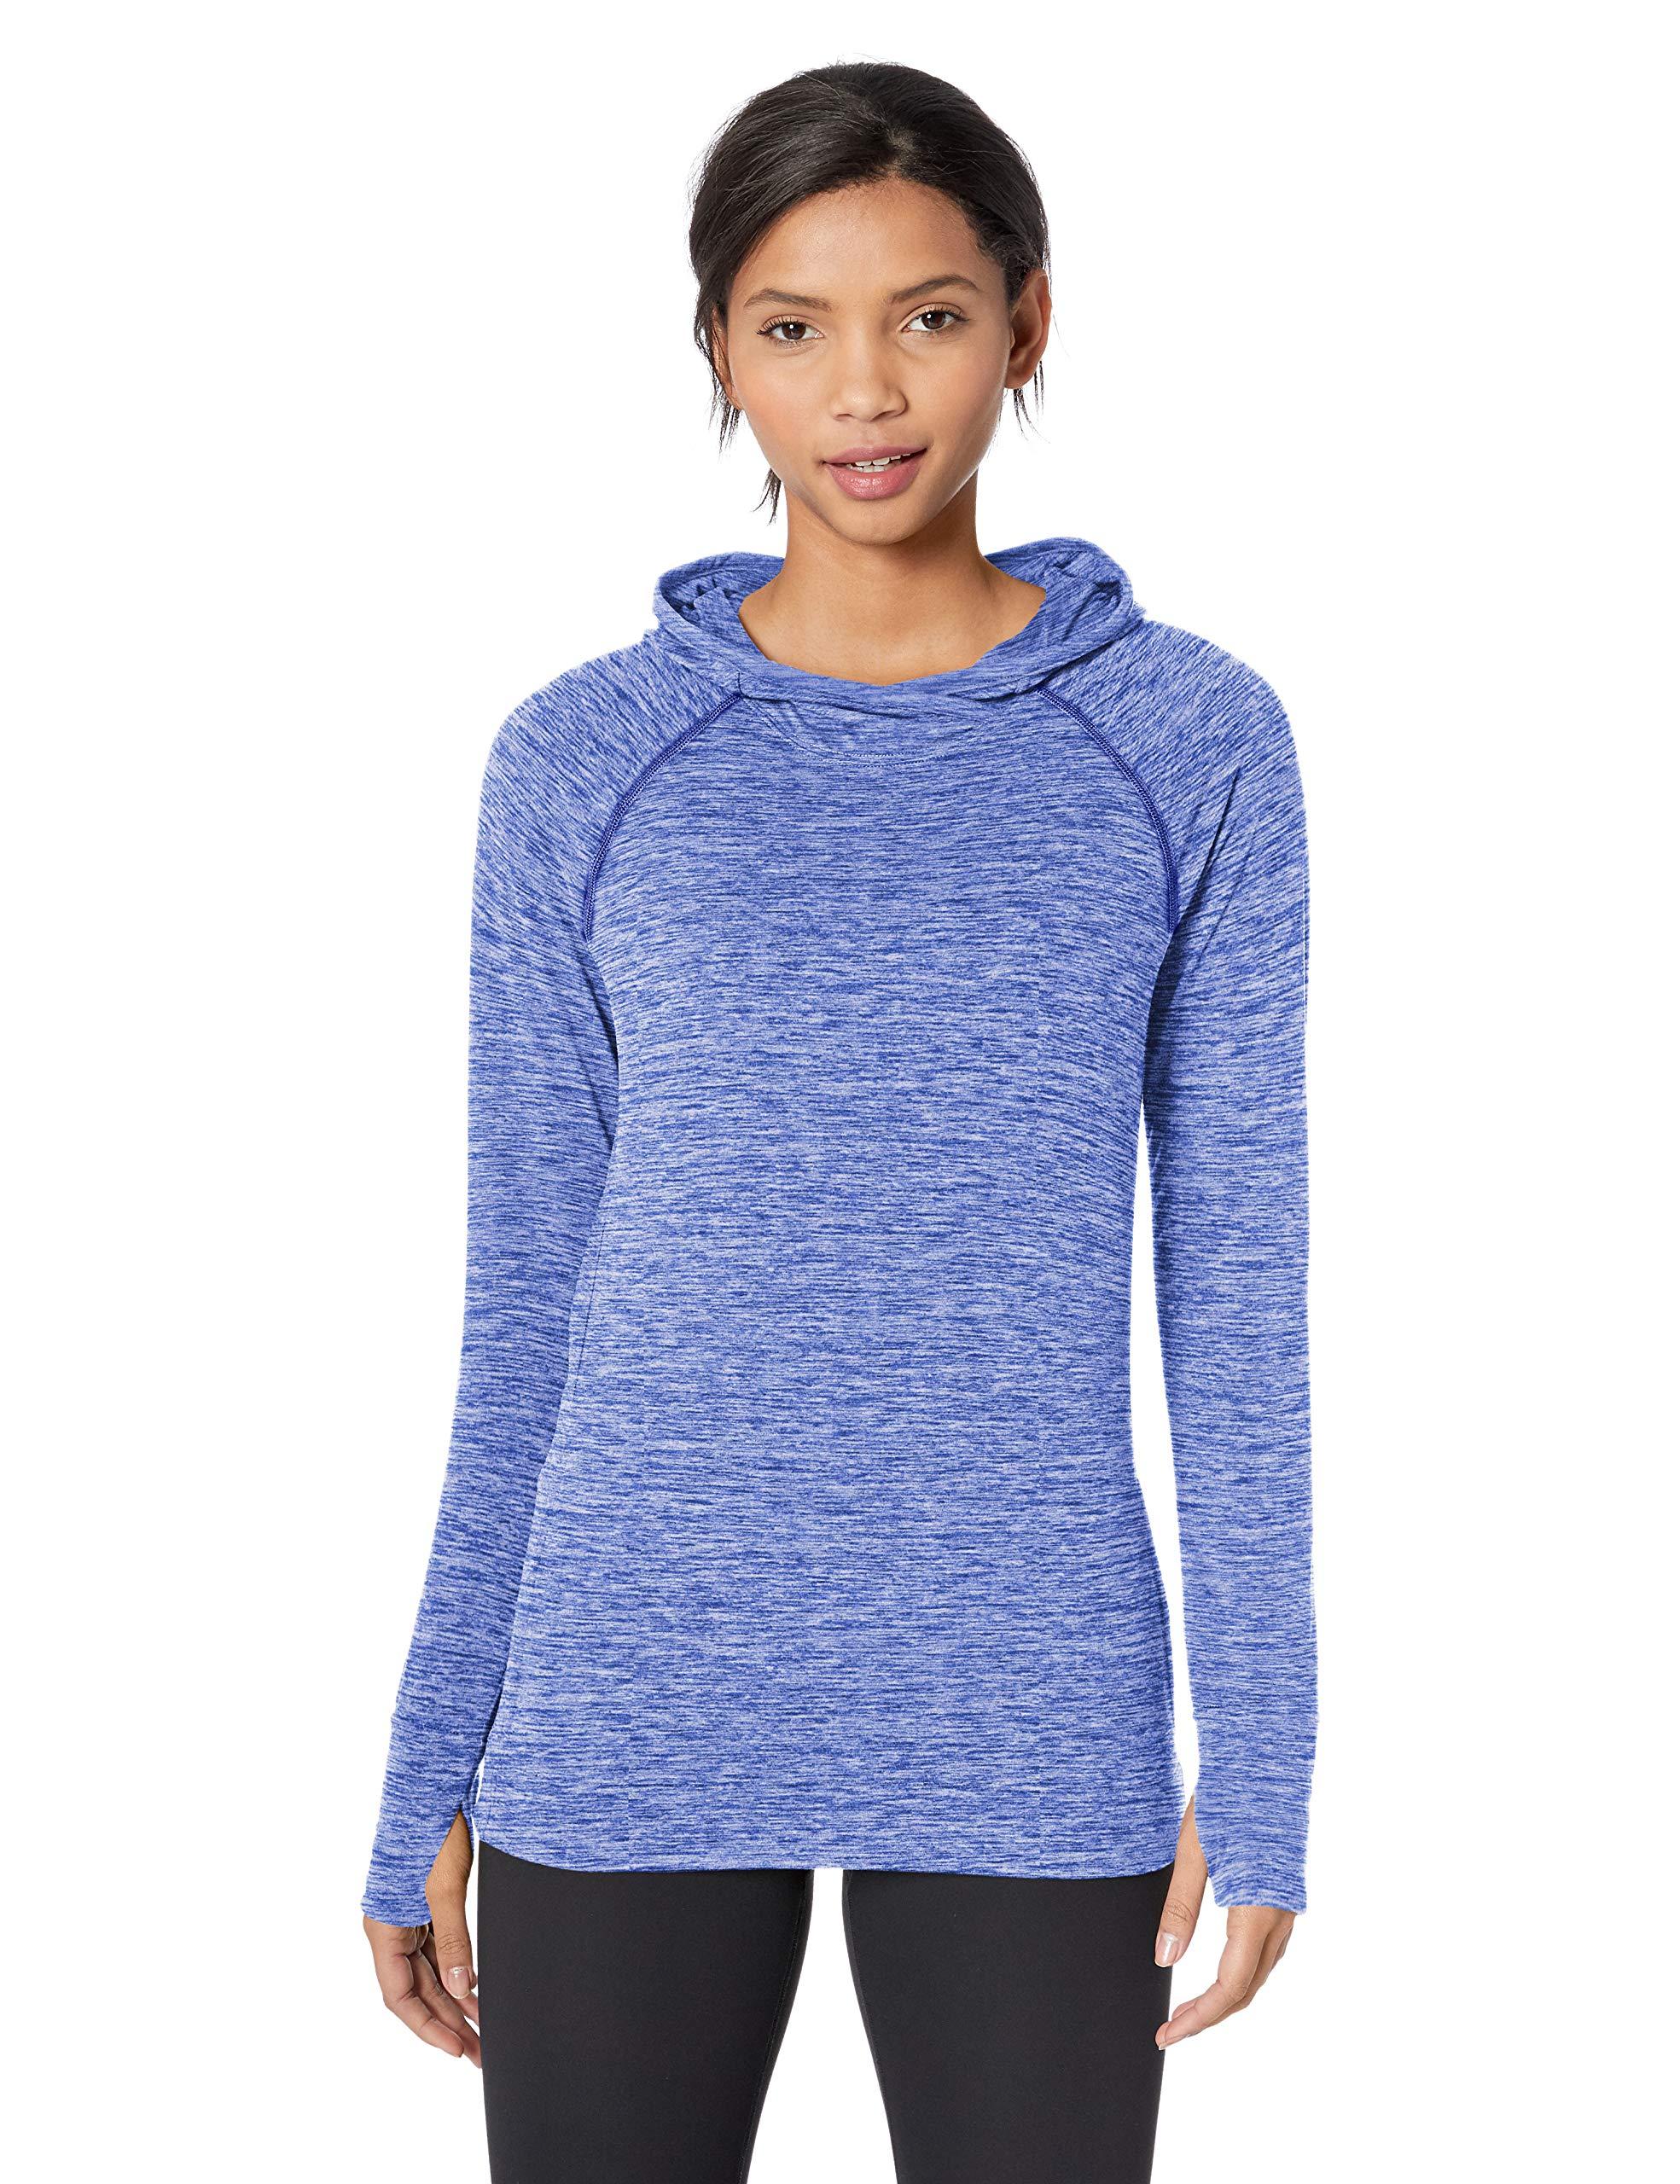 Amazon Essentials Women's Brushed Tech Stretch Popover Hoodie, Blue Space dye, Medium